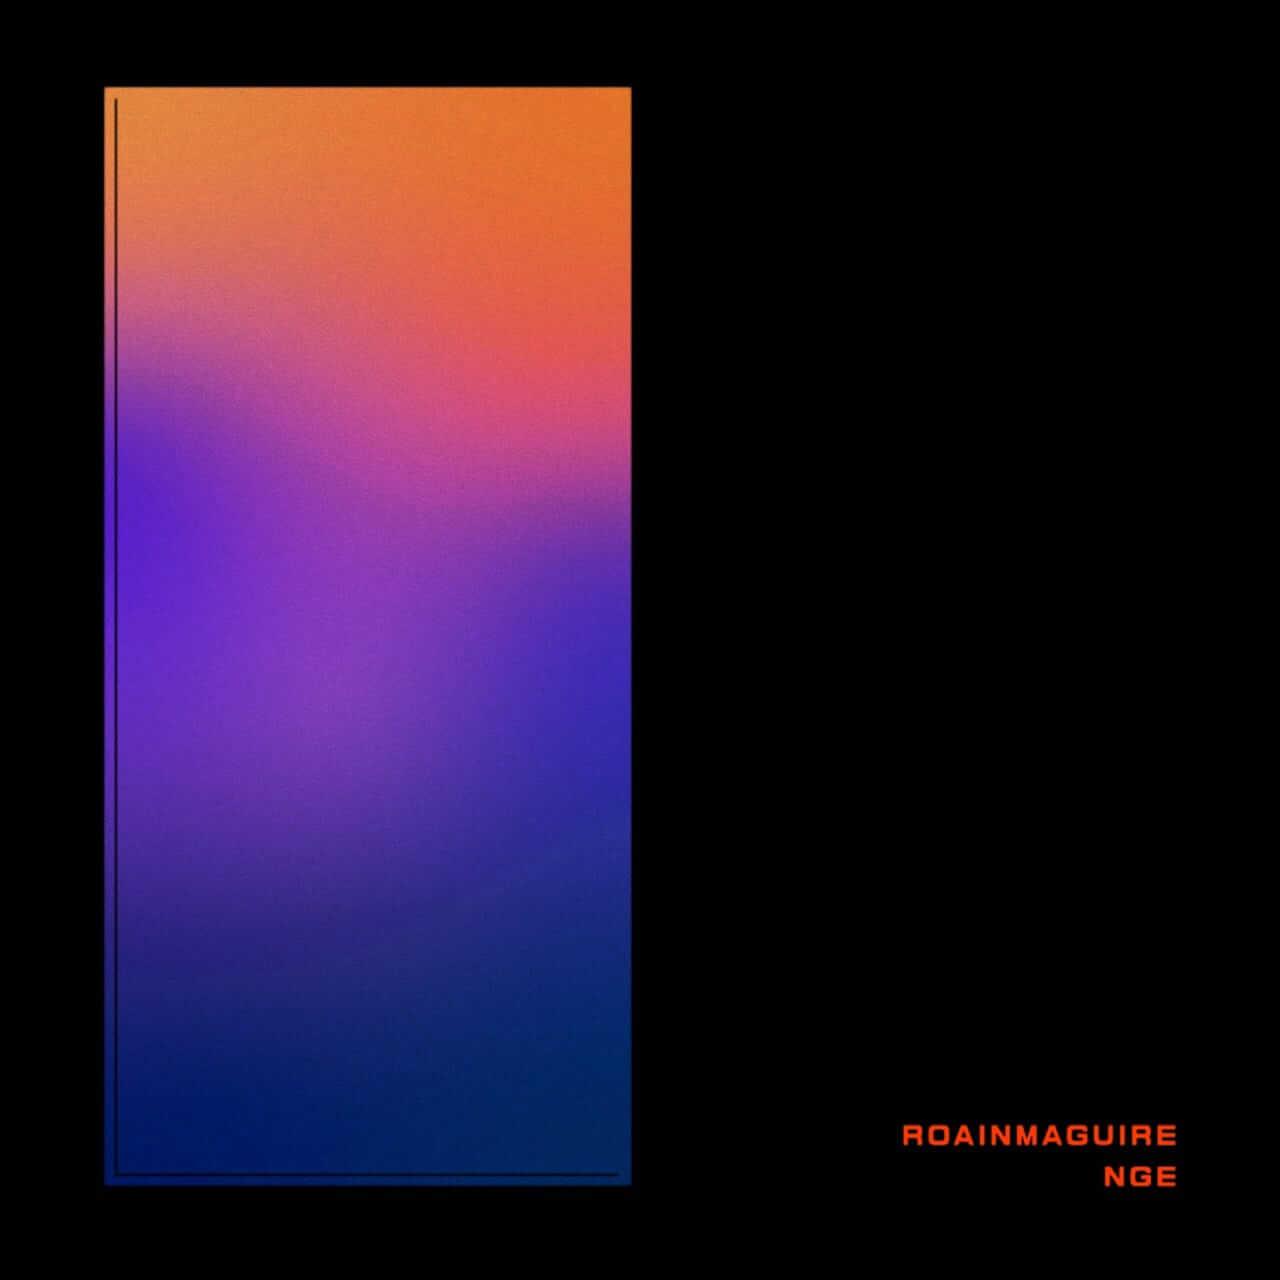 MAGUIRE インタビュー   New EP『I'MA RACER』リリース、仙台を拠点にする新世代アーティスト